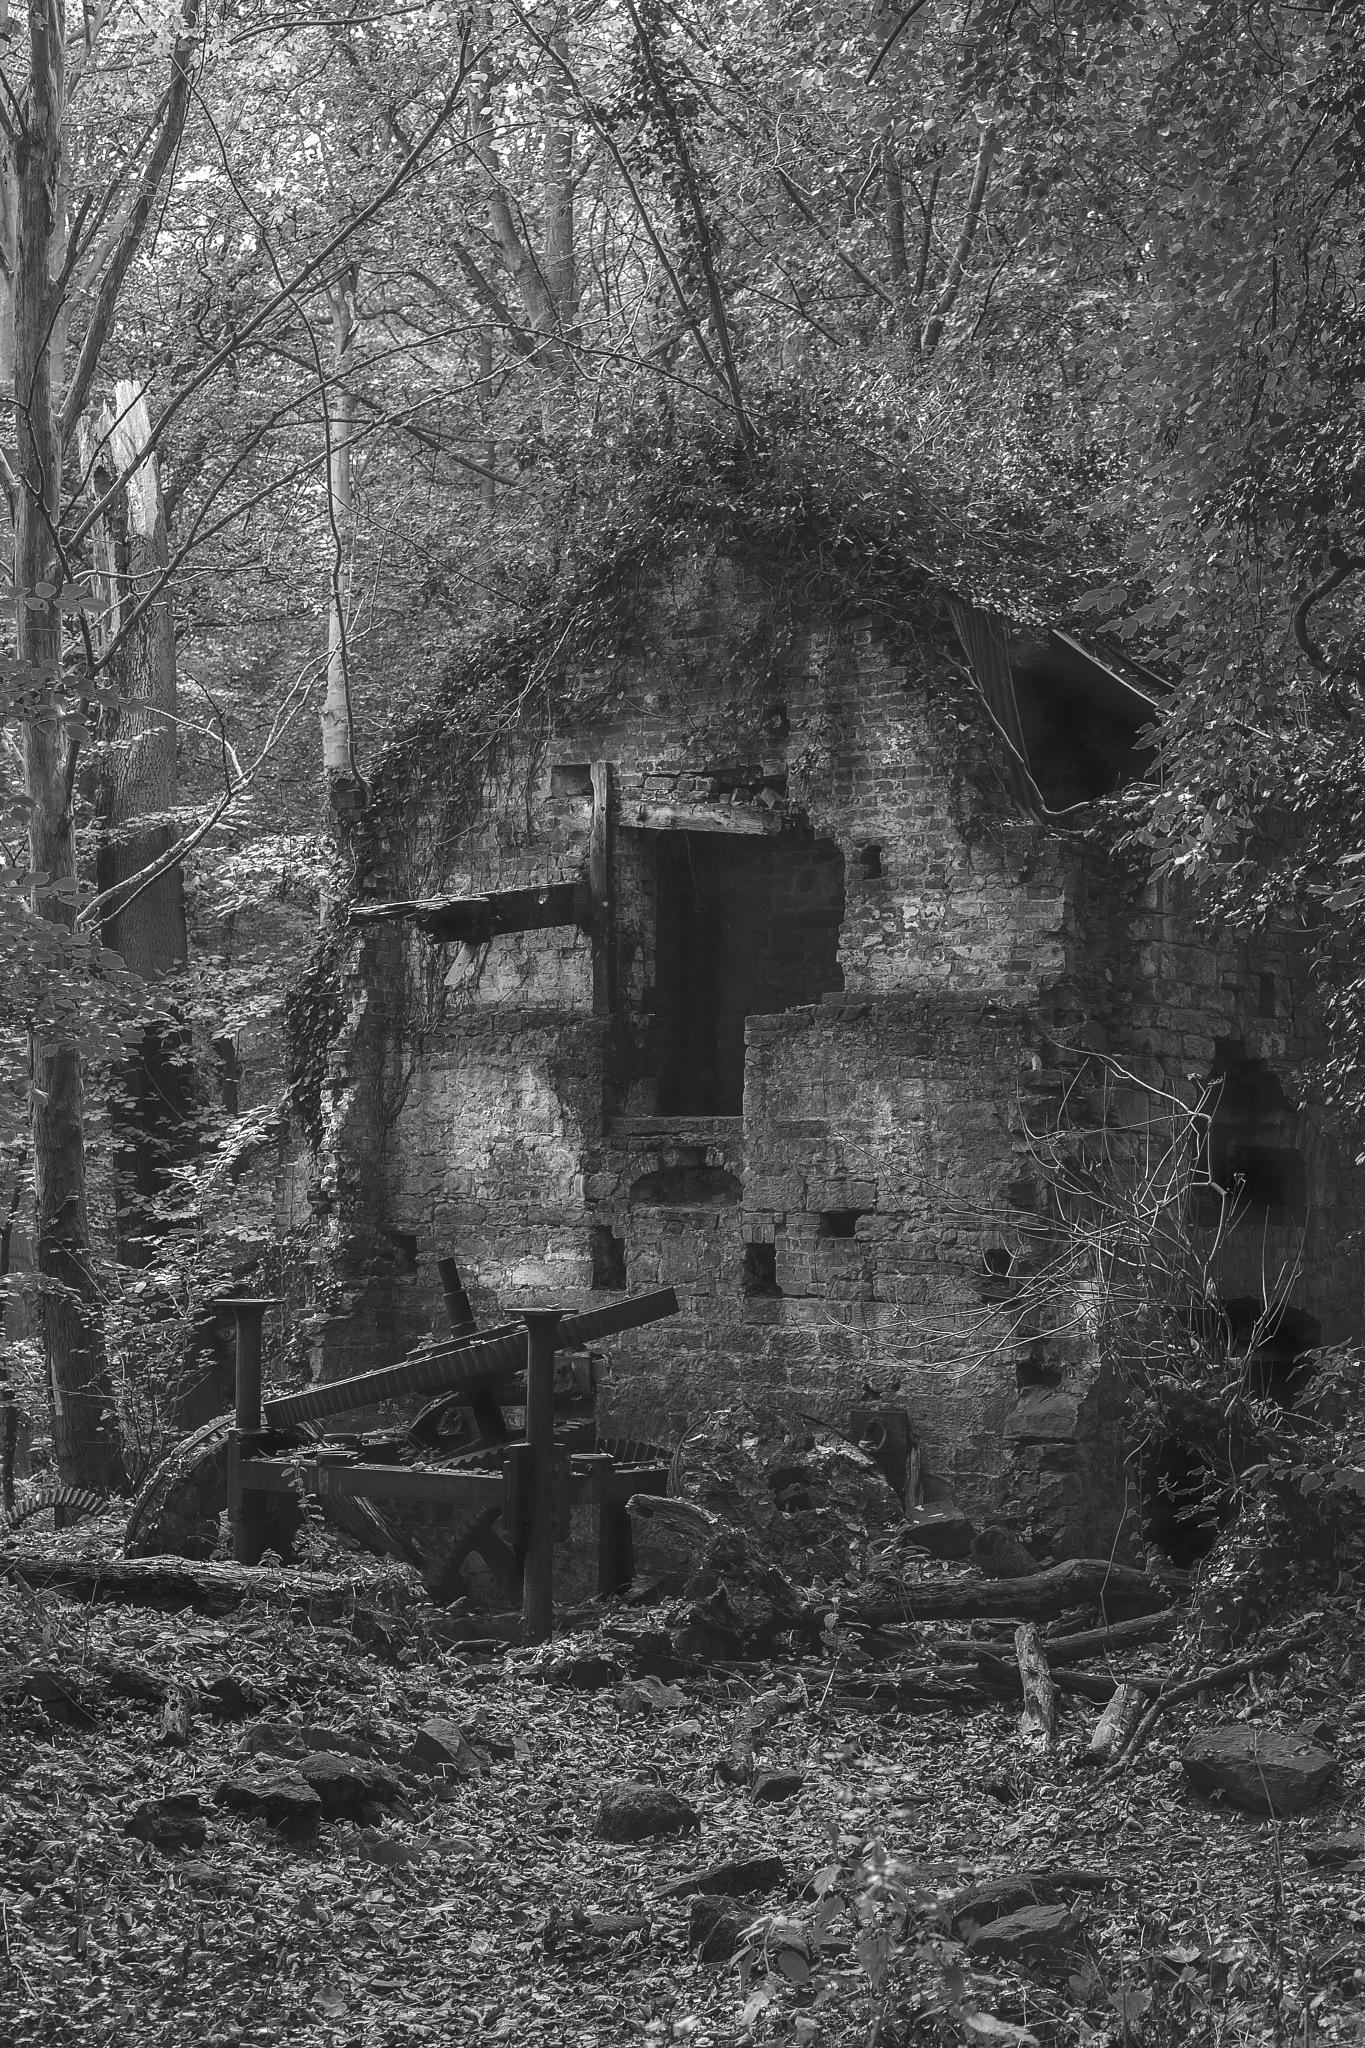 Corn Mill Ruins by charliedapper